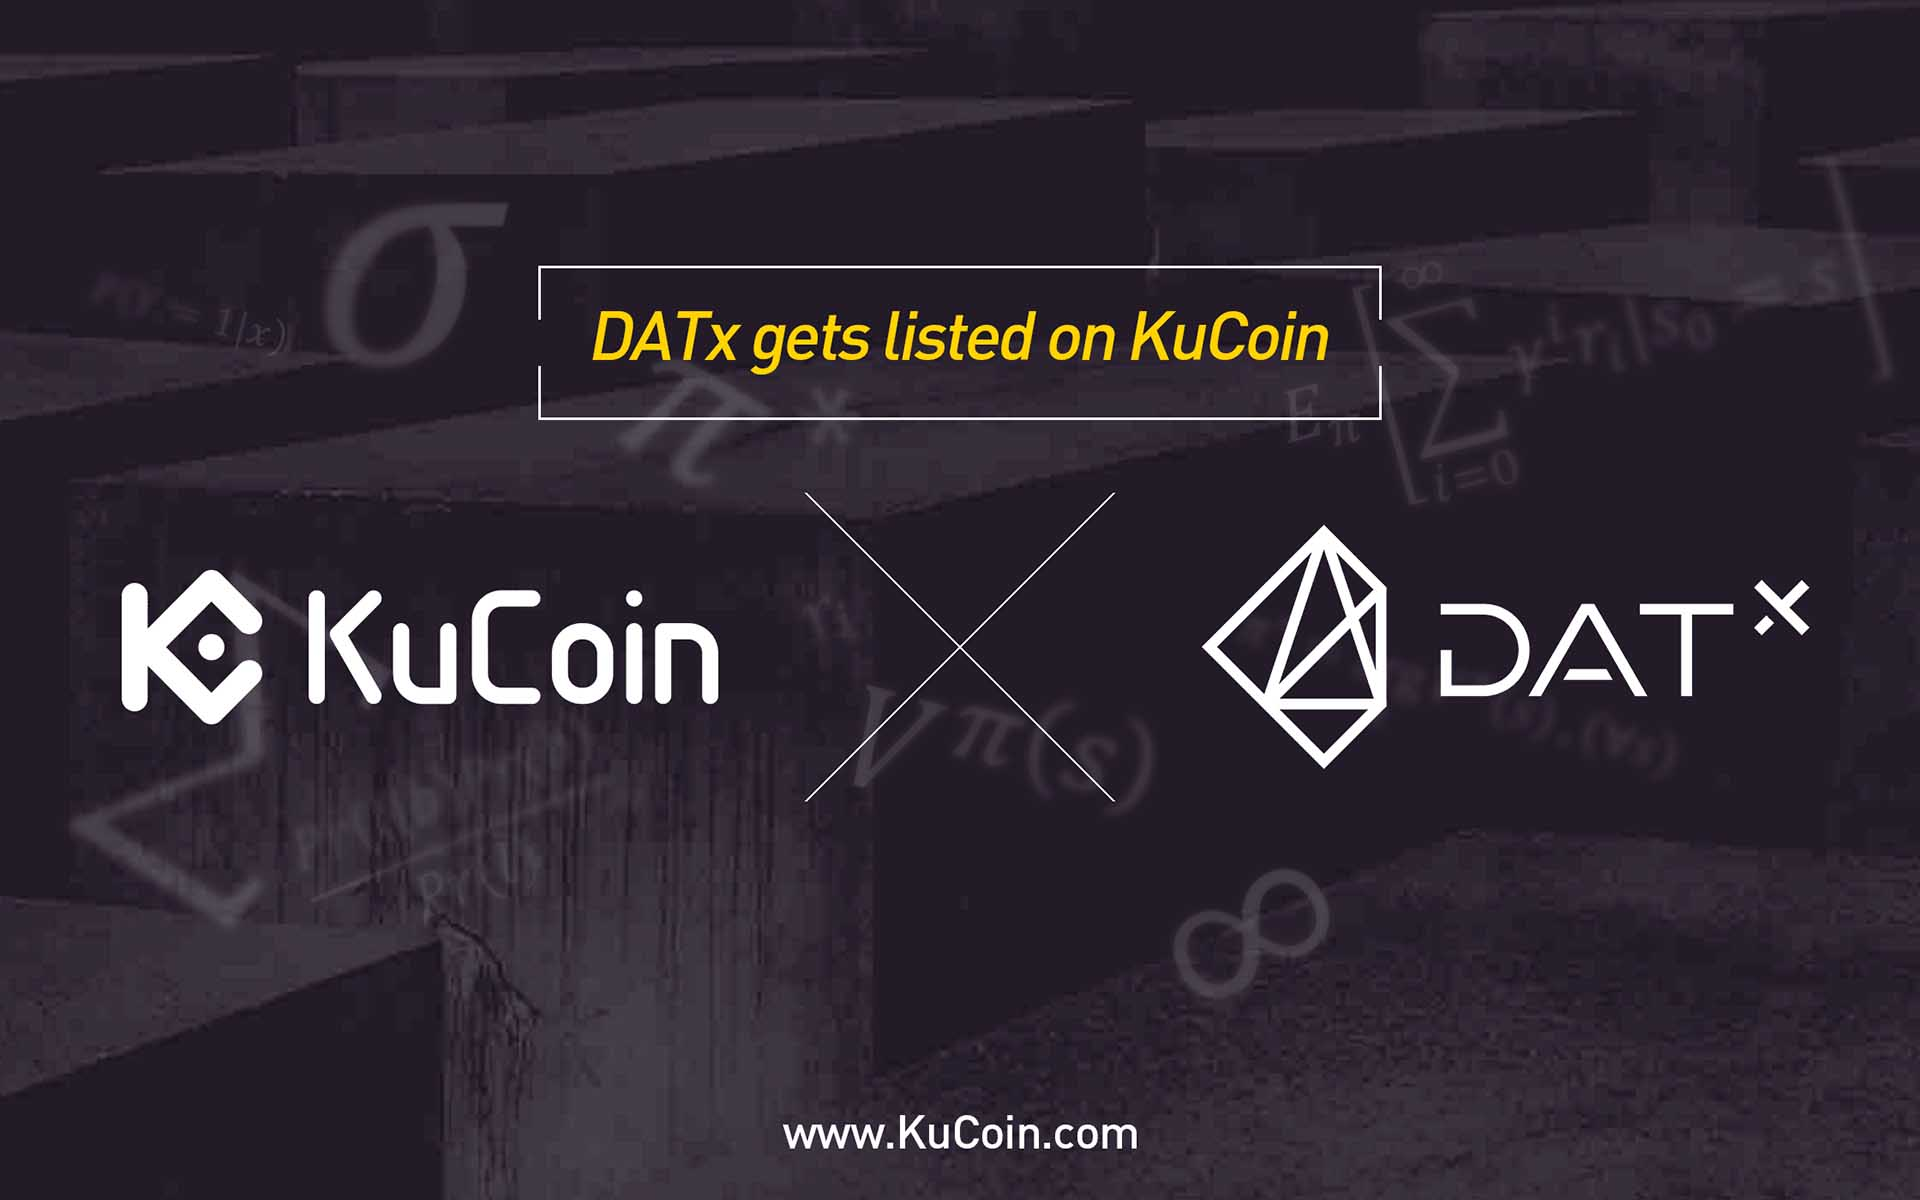 DATx (DATX) Gets Listed On KuCoin